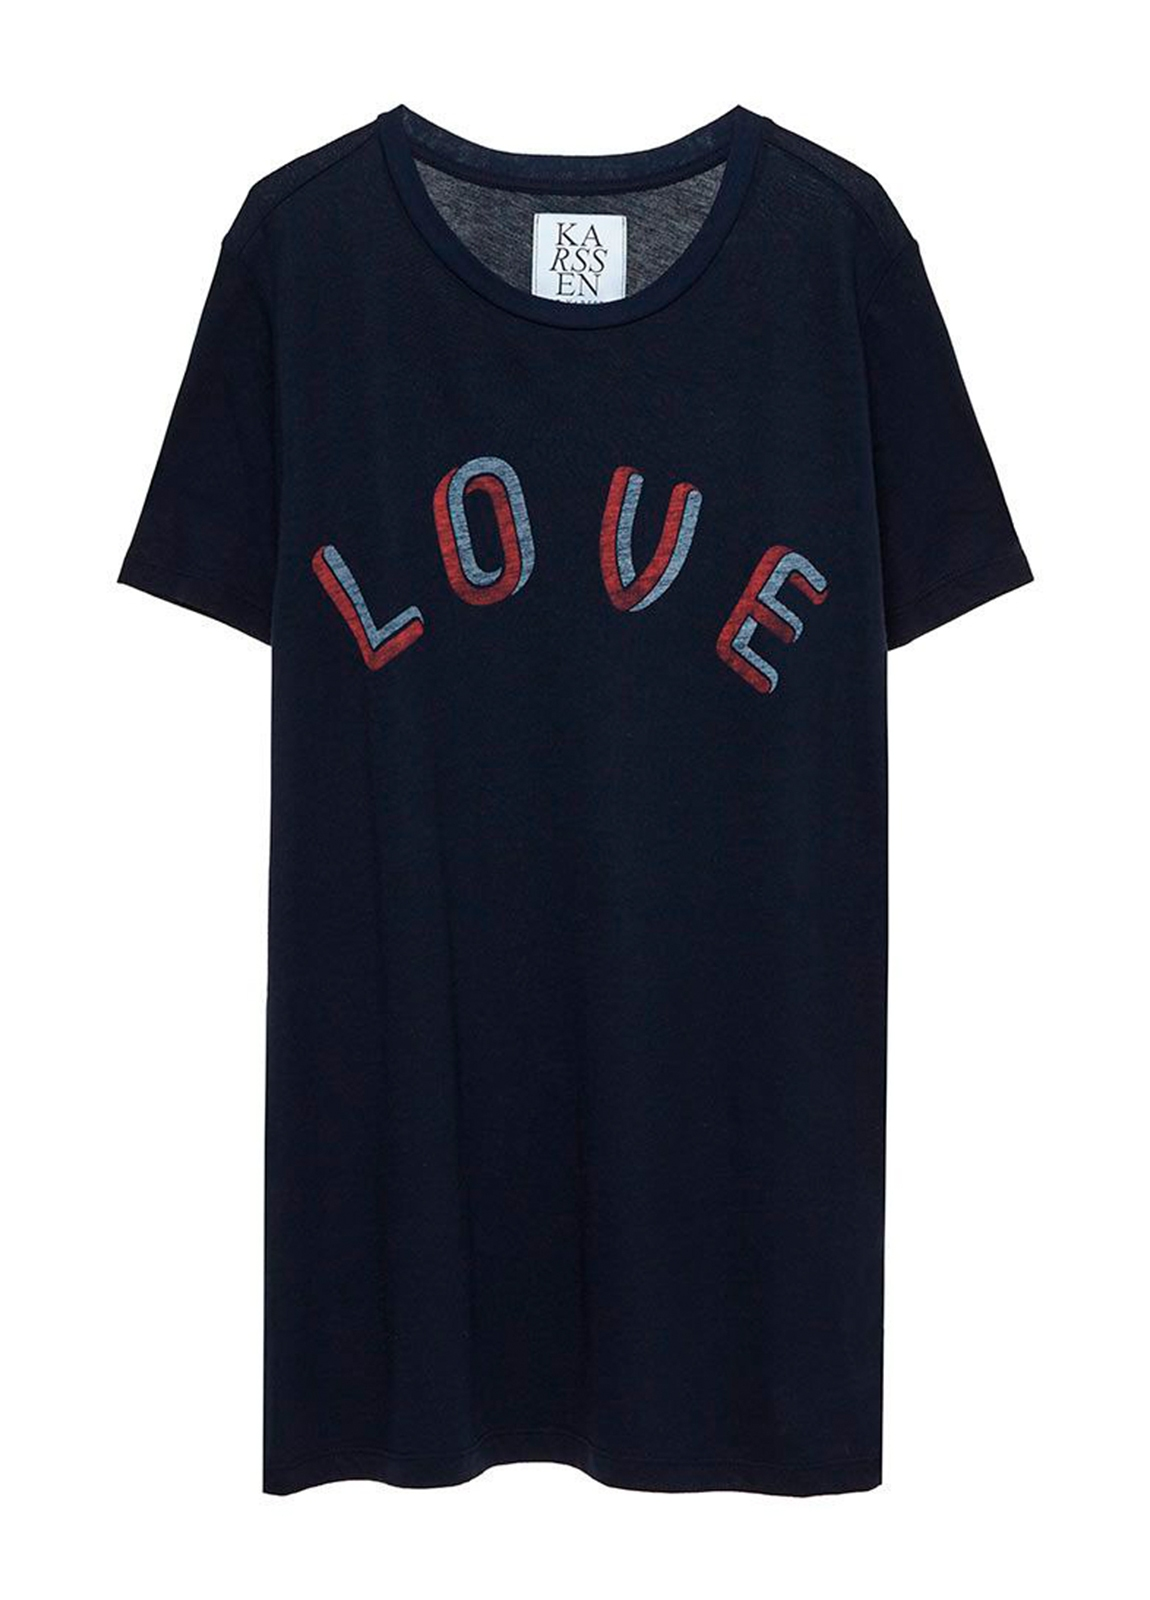 Camiseta manga corta color negro con estampado gráfico. 50% Algodón 50% Modal. - Ítem1